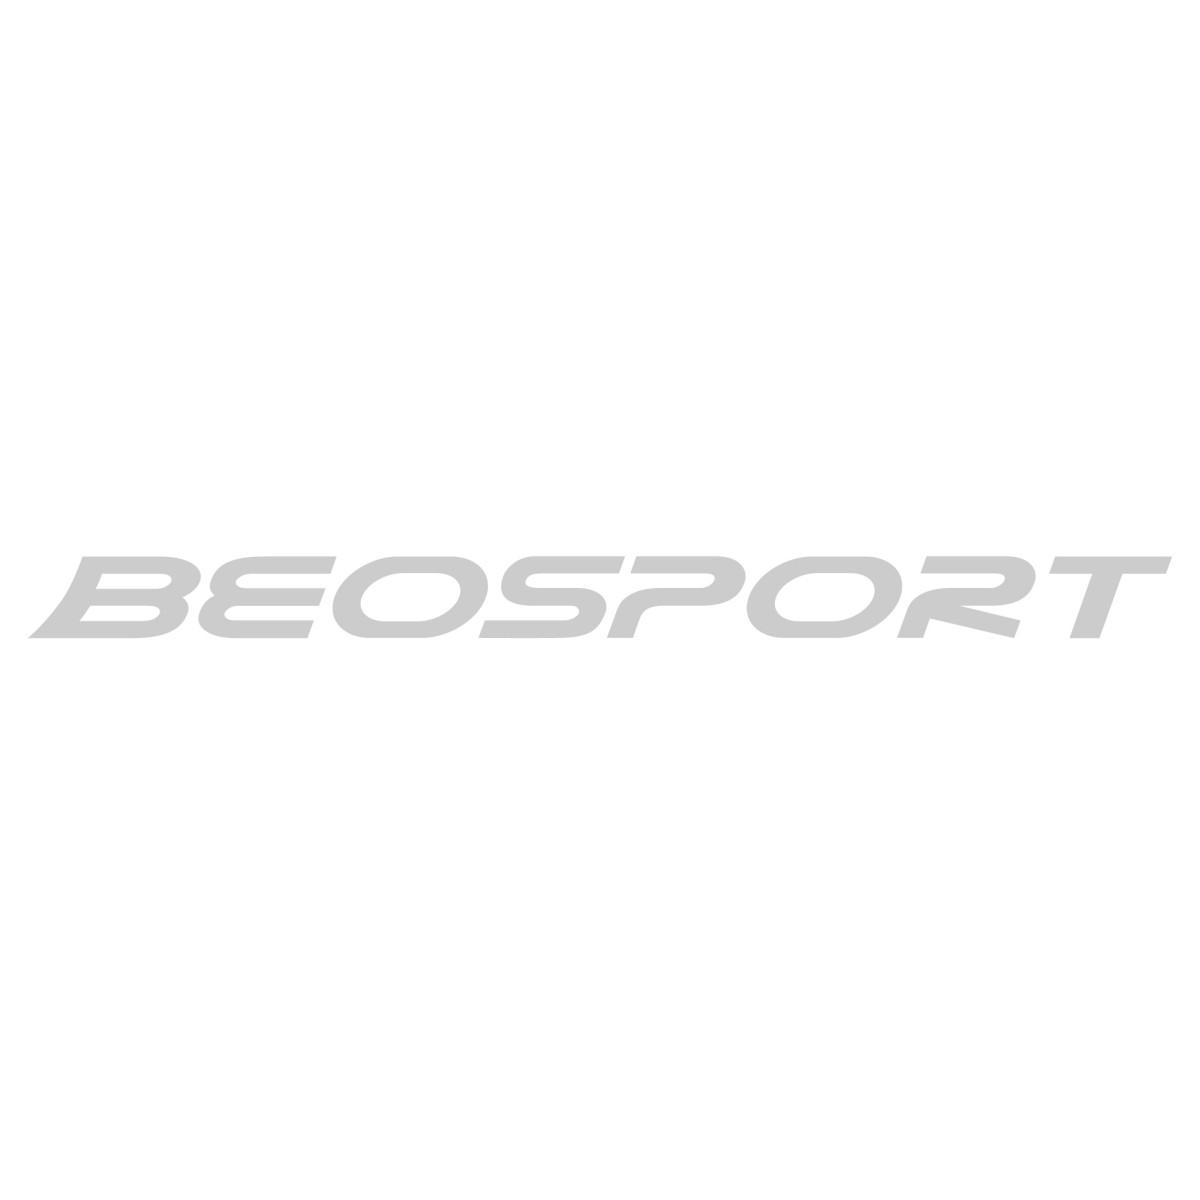 Wilson Rf Legacy loptice za tenis